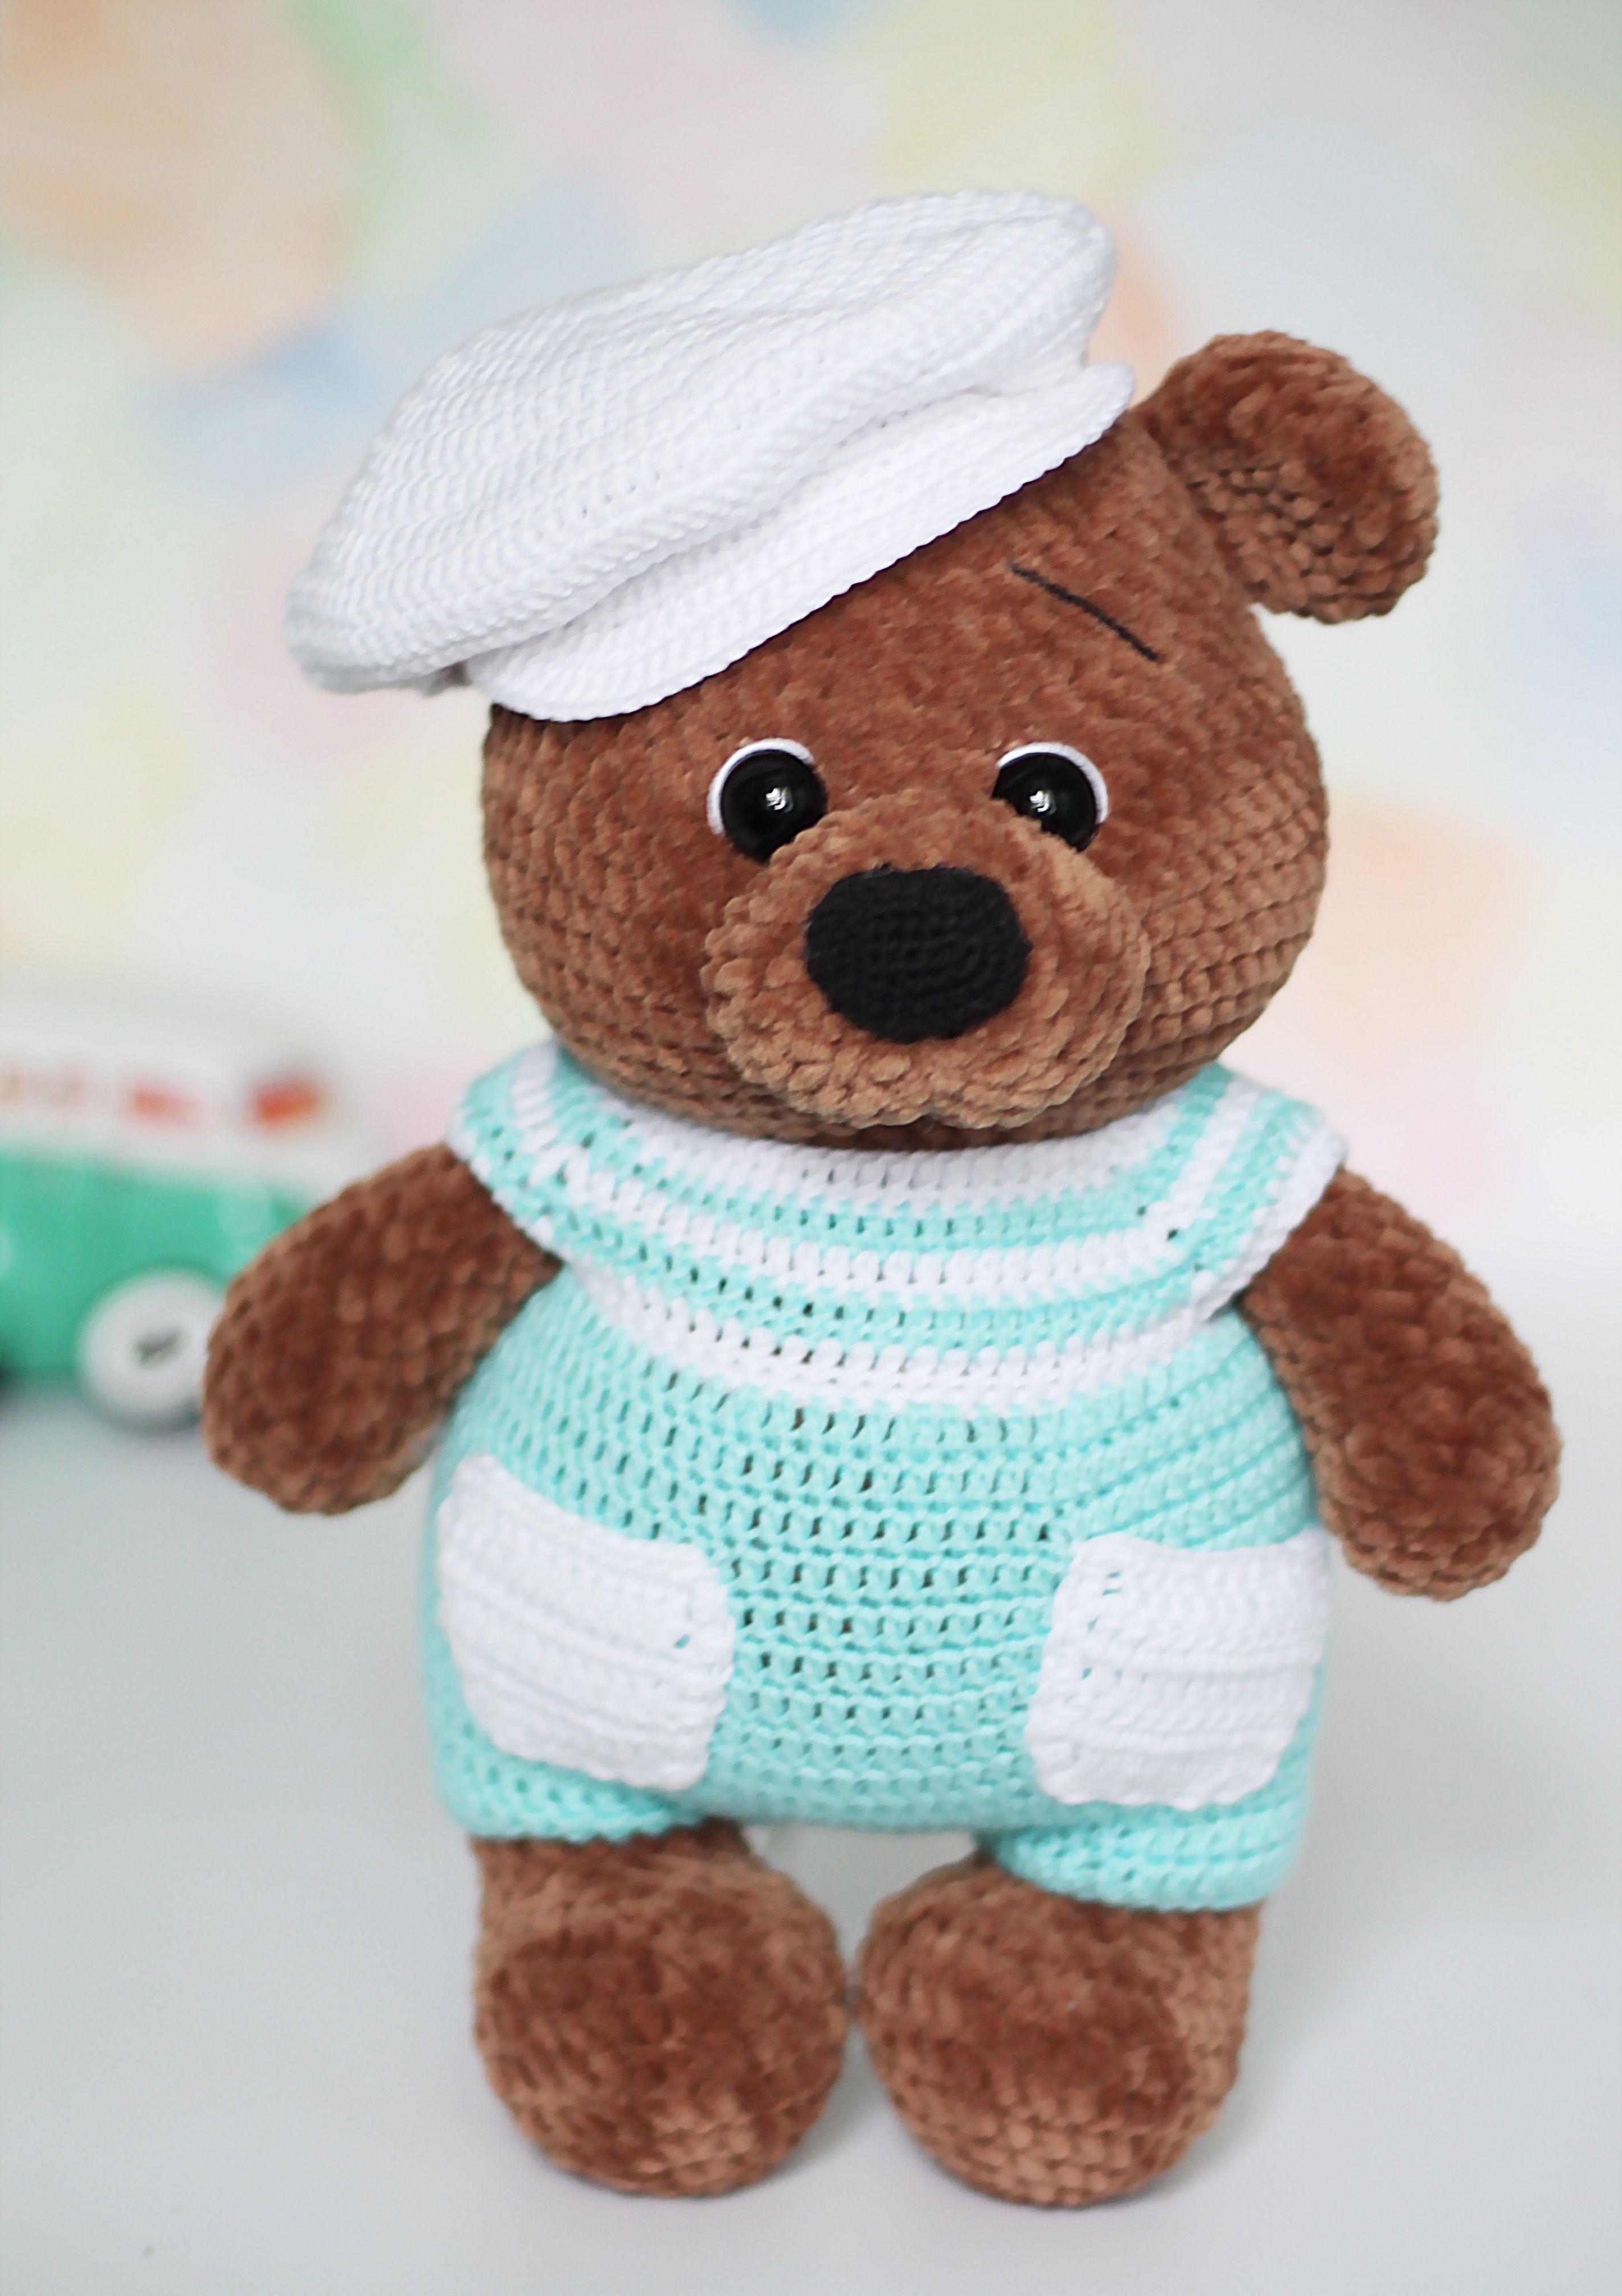 Amigurumi Plush Teddy Bear Free crochet pattern - Amigurumi Crochet | 4032x2848